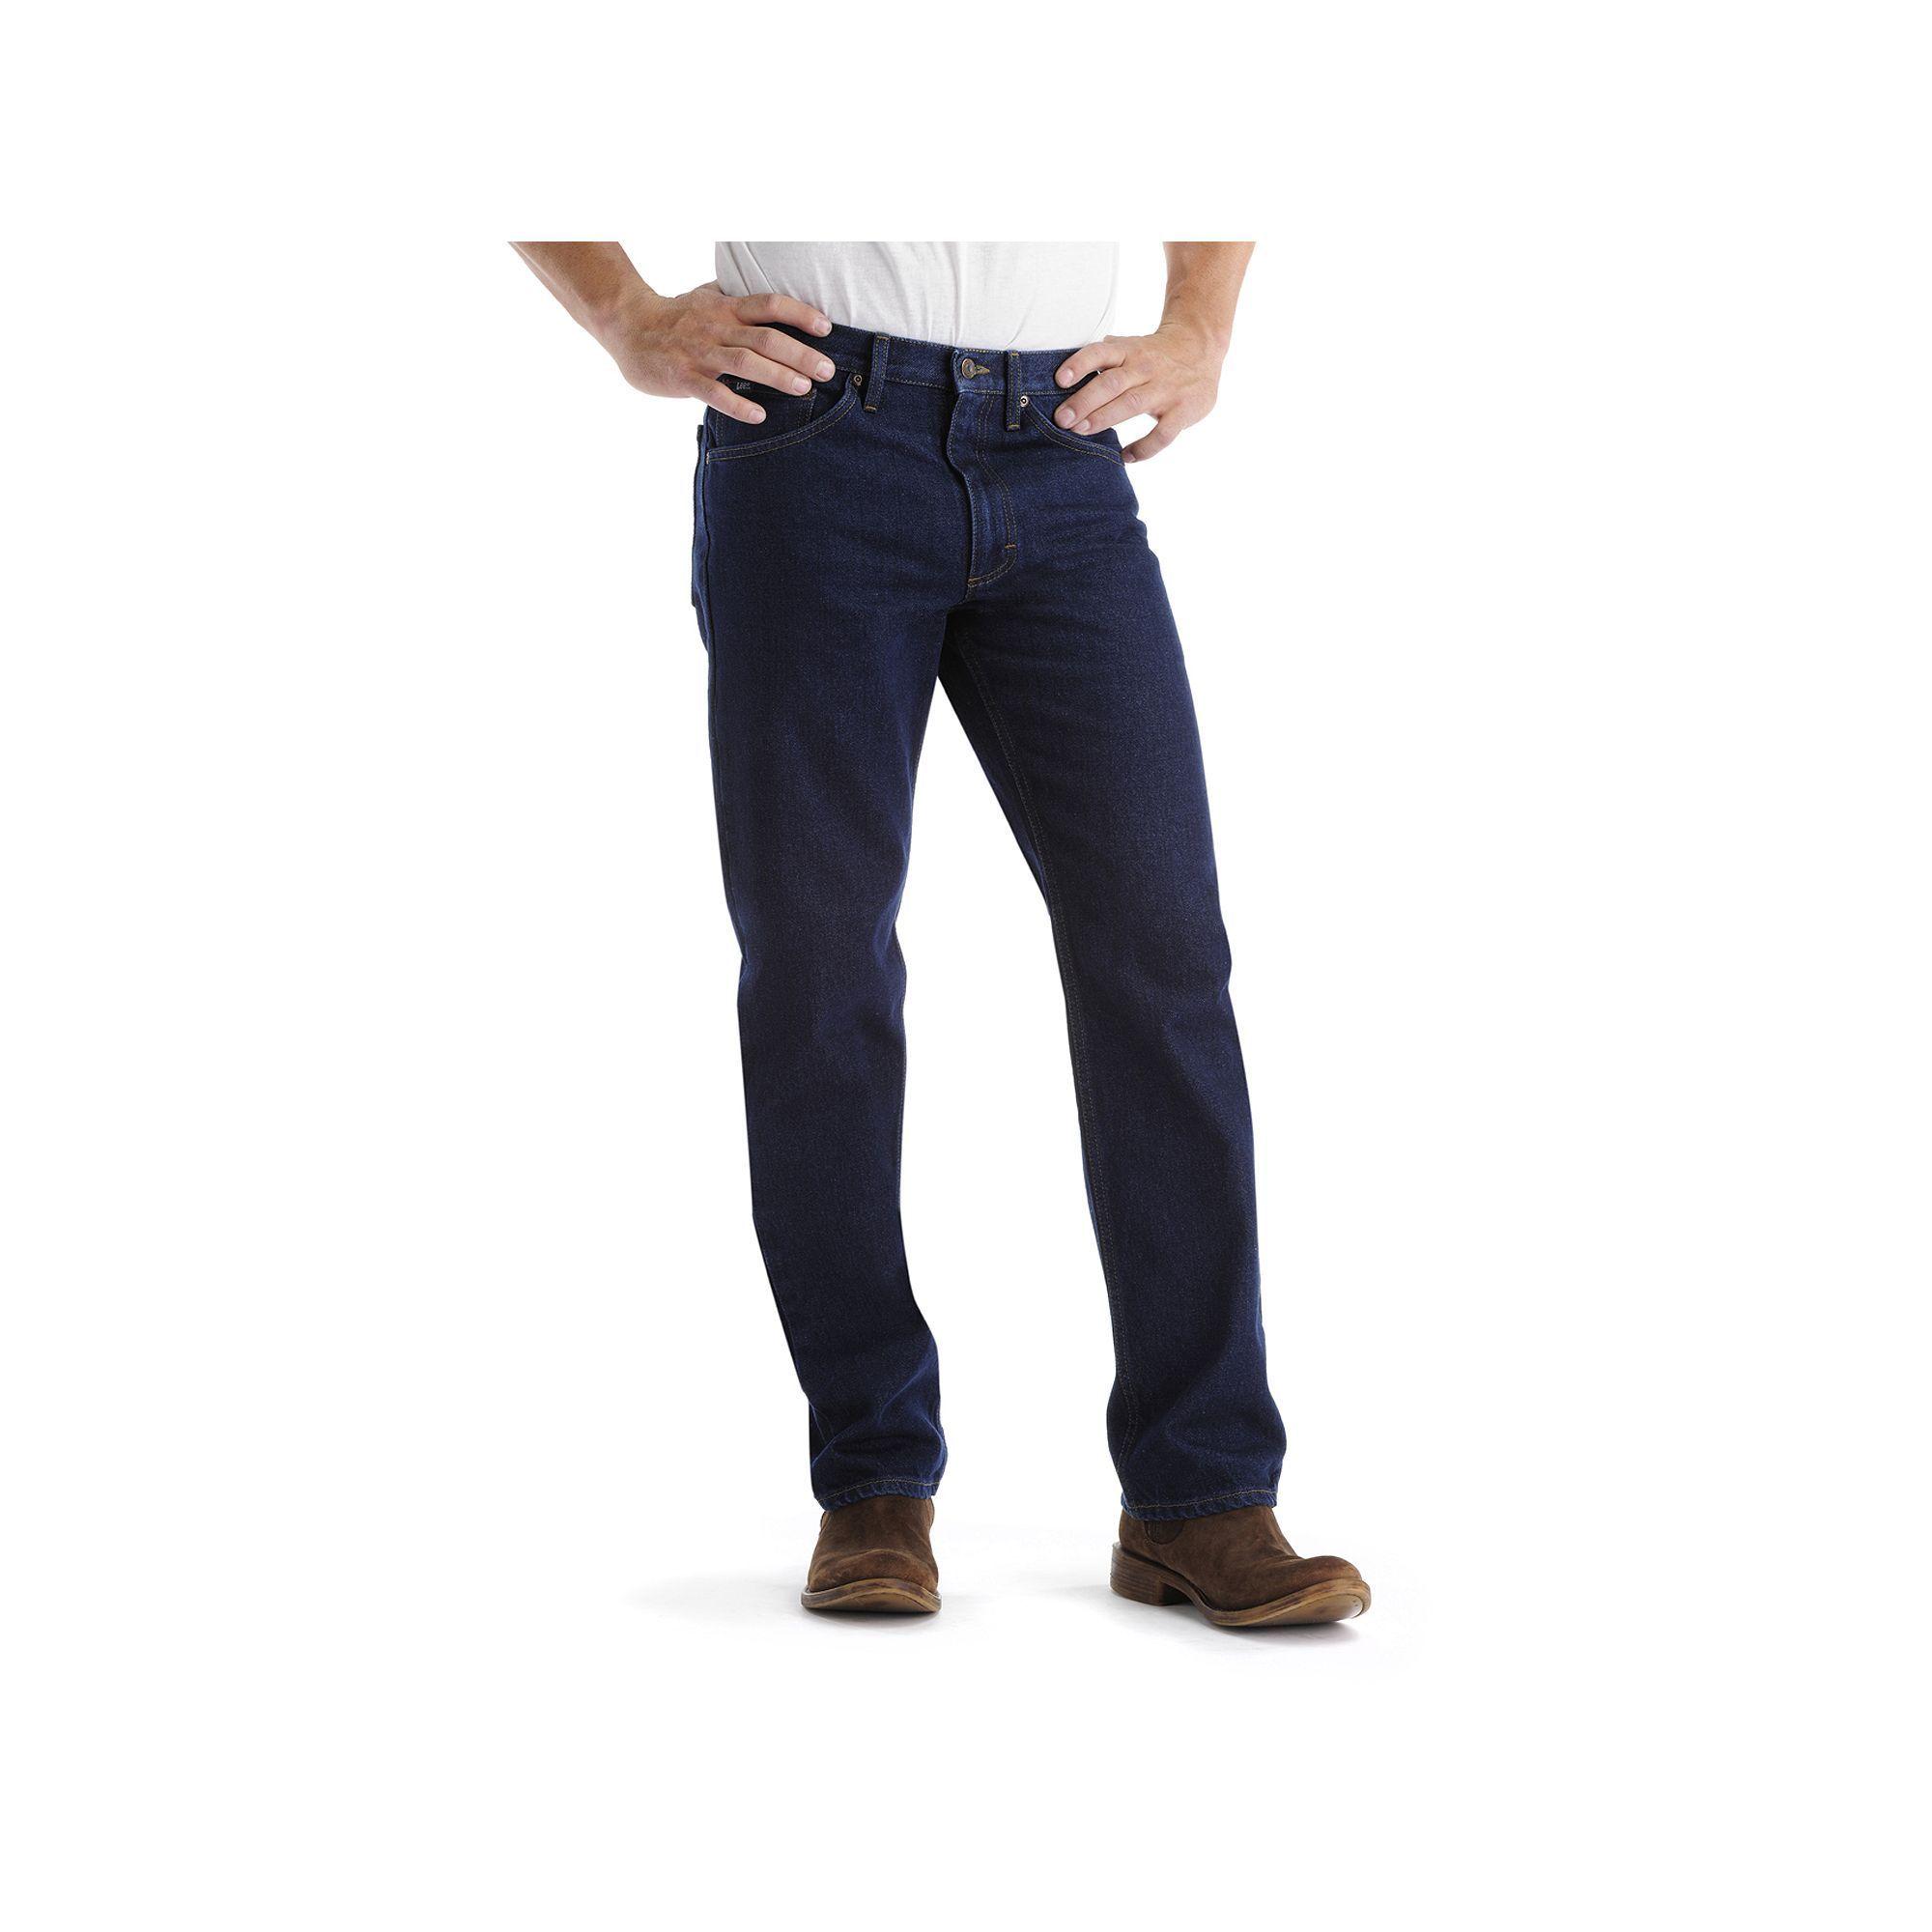 ef314d33 Big & Tall Lee Regular Straight-Leg Jeans, Men's, Size: 44X30, Blue ...